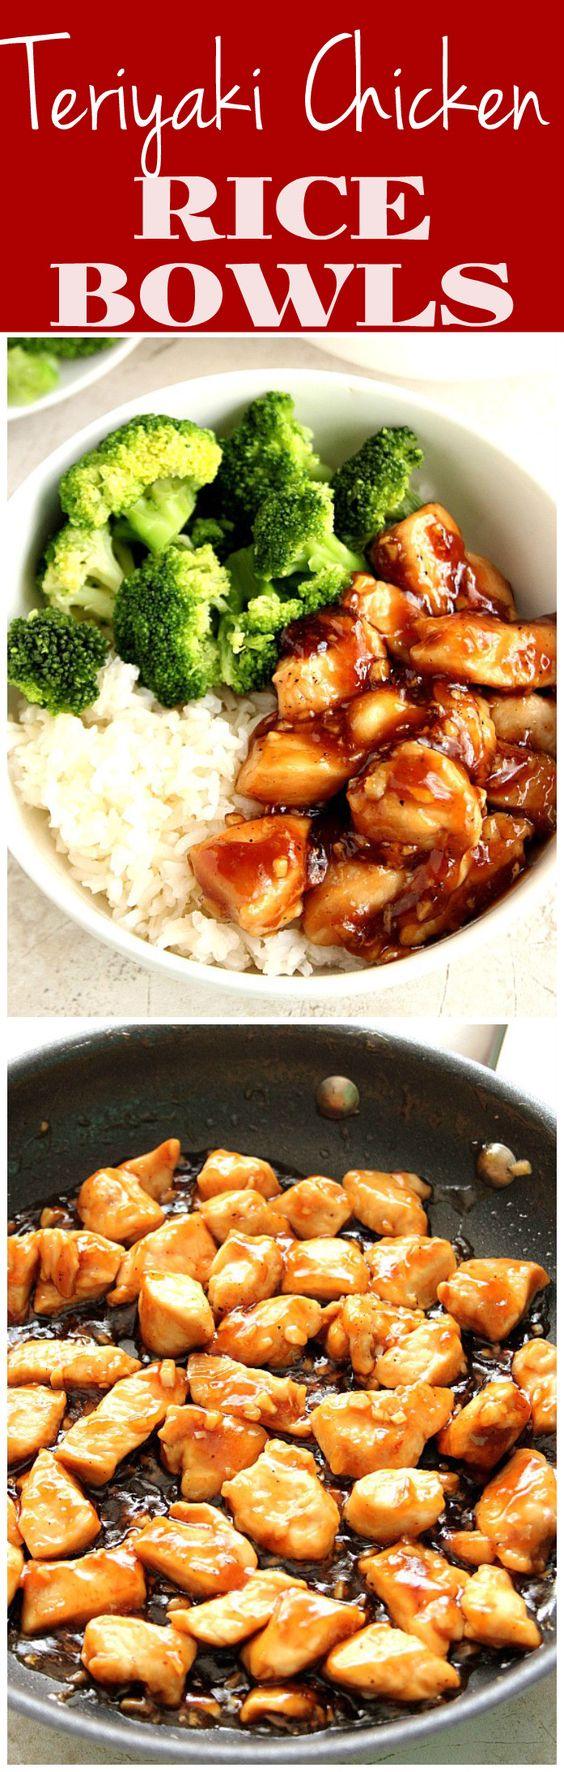 Quick Teriyaki Chicken Rice Bowls Quick Teriyaki Chicken Rice Bowls